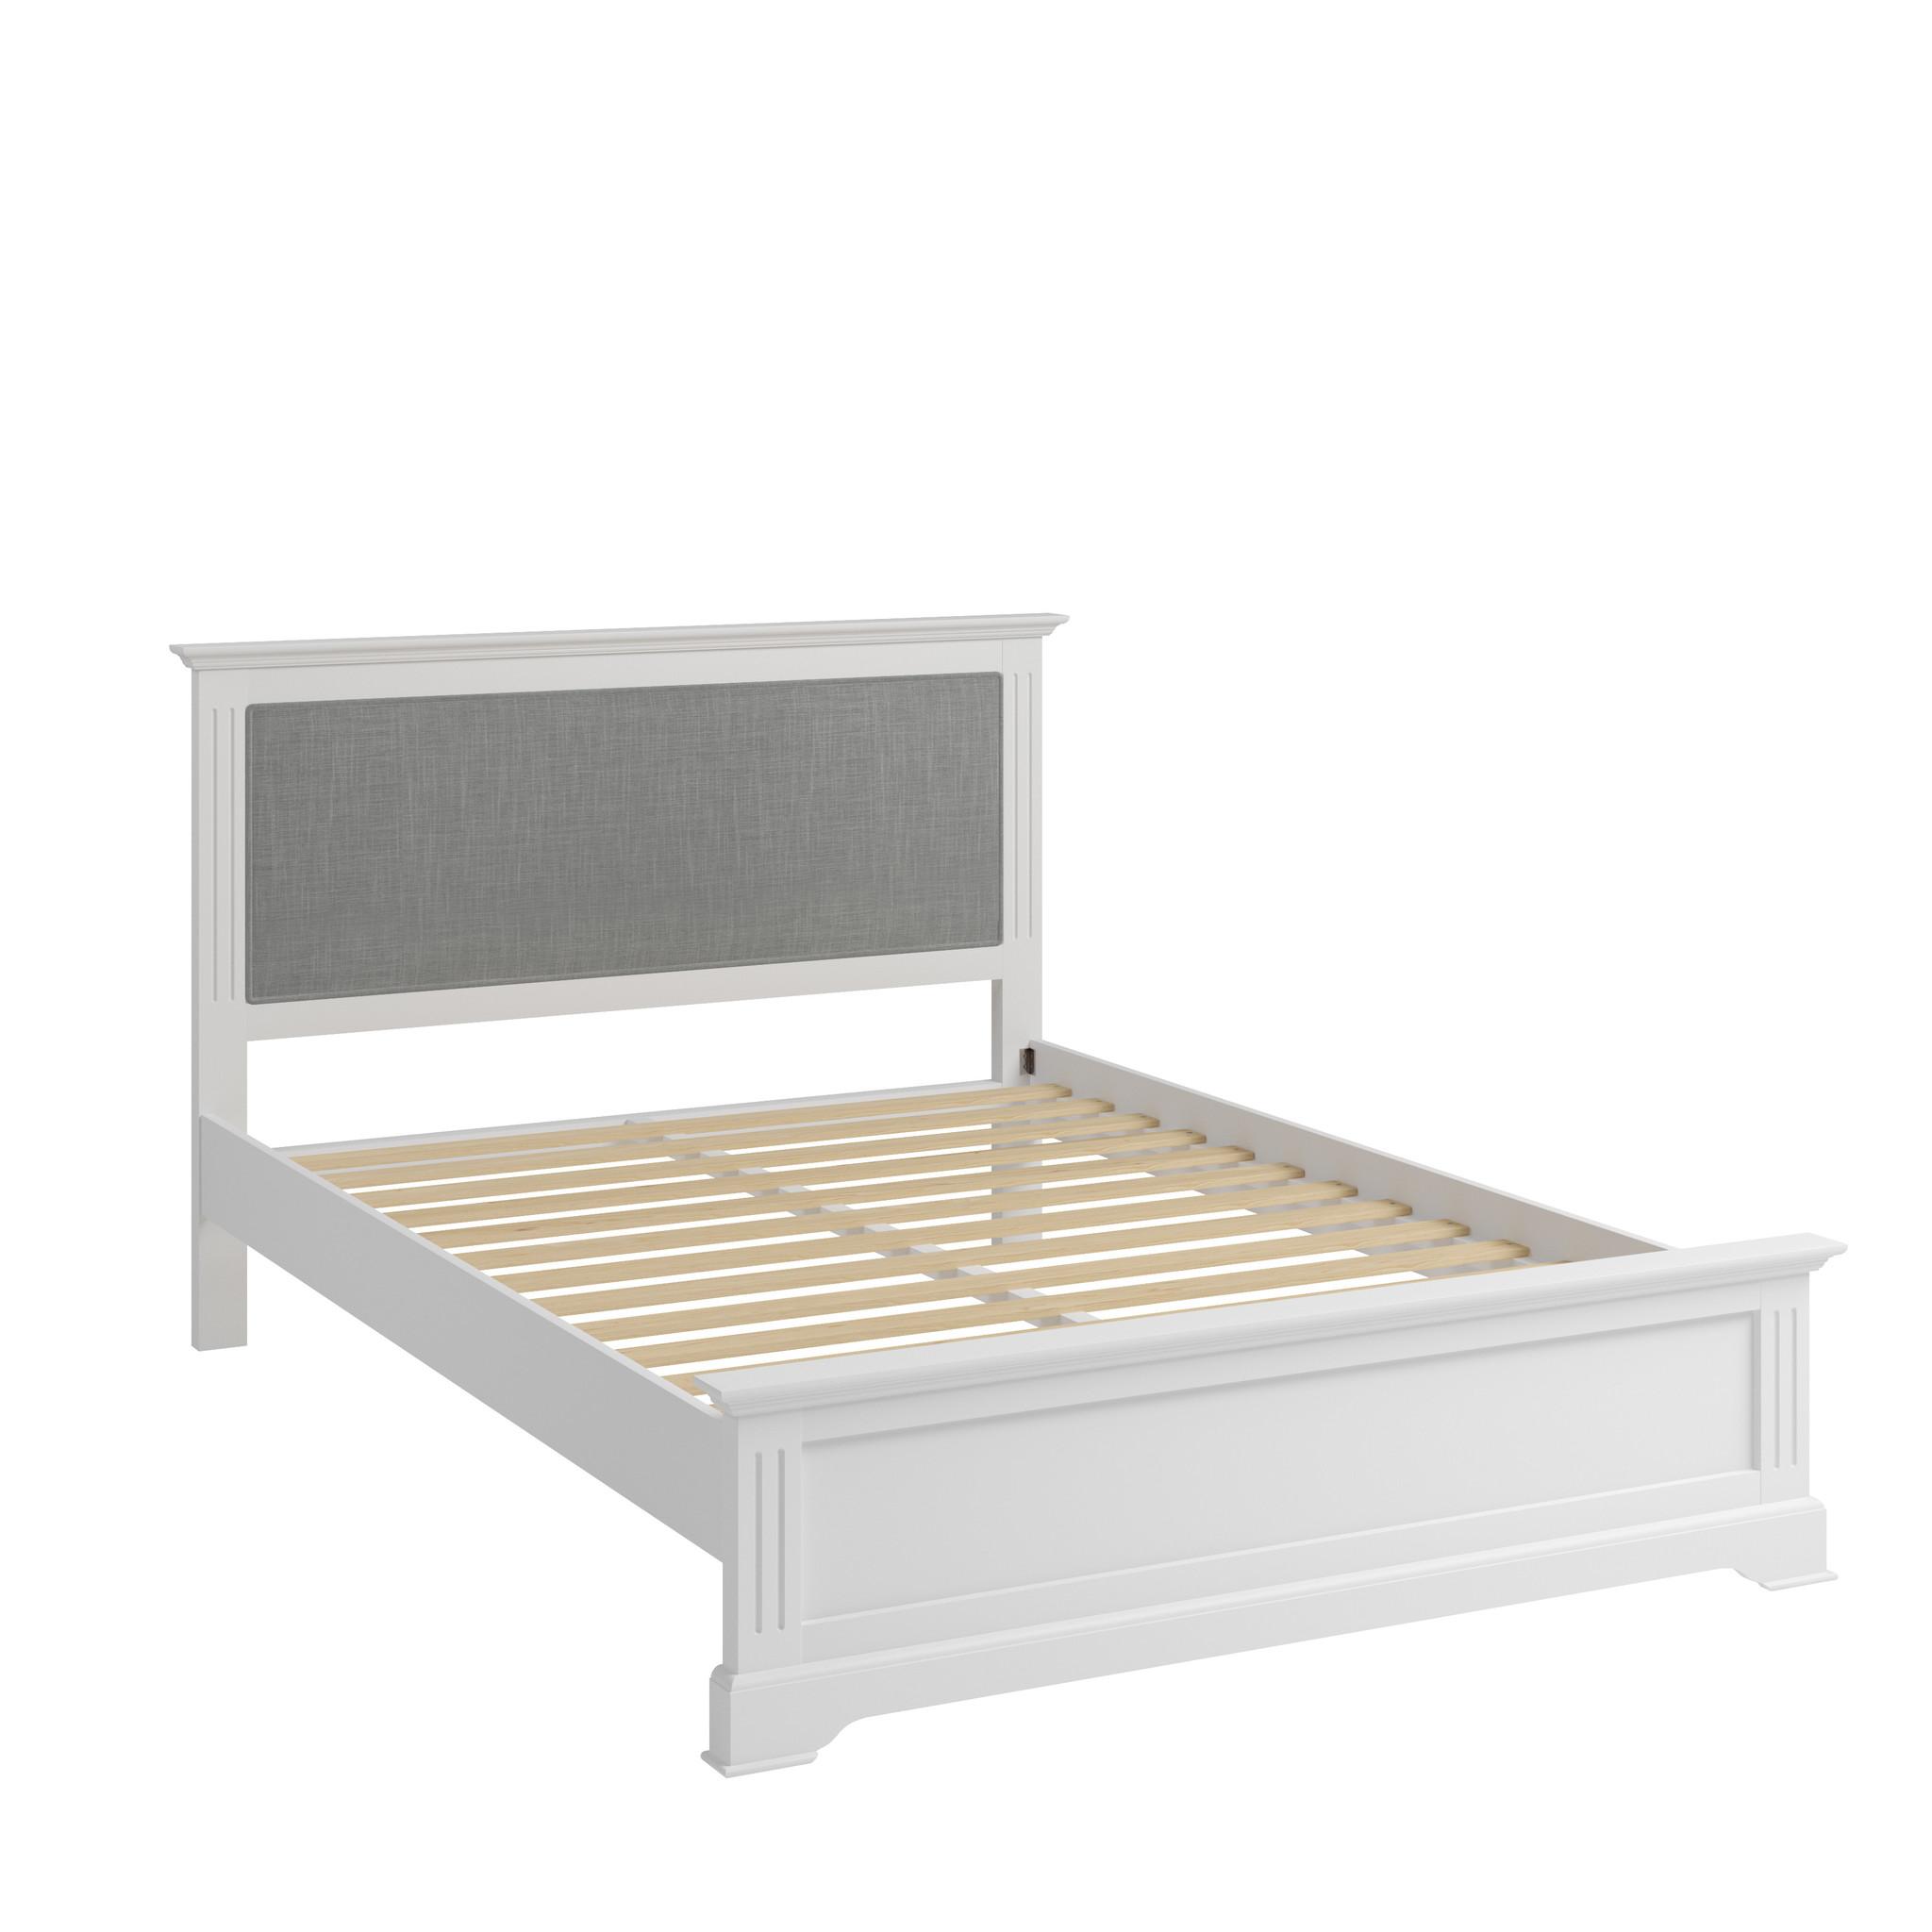 Essentials Elegant White & Grey Bed Frame - King Size